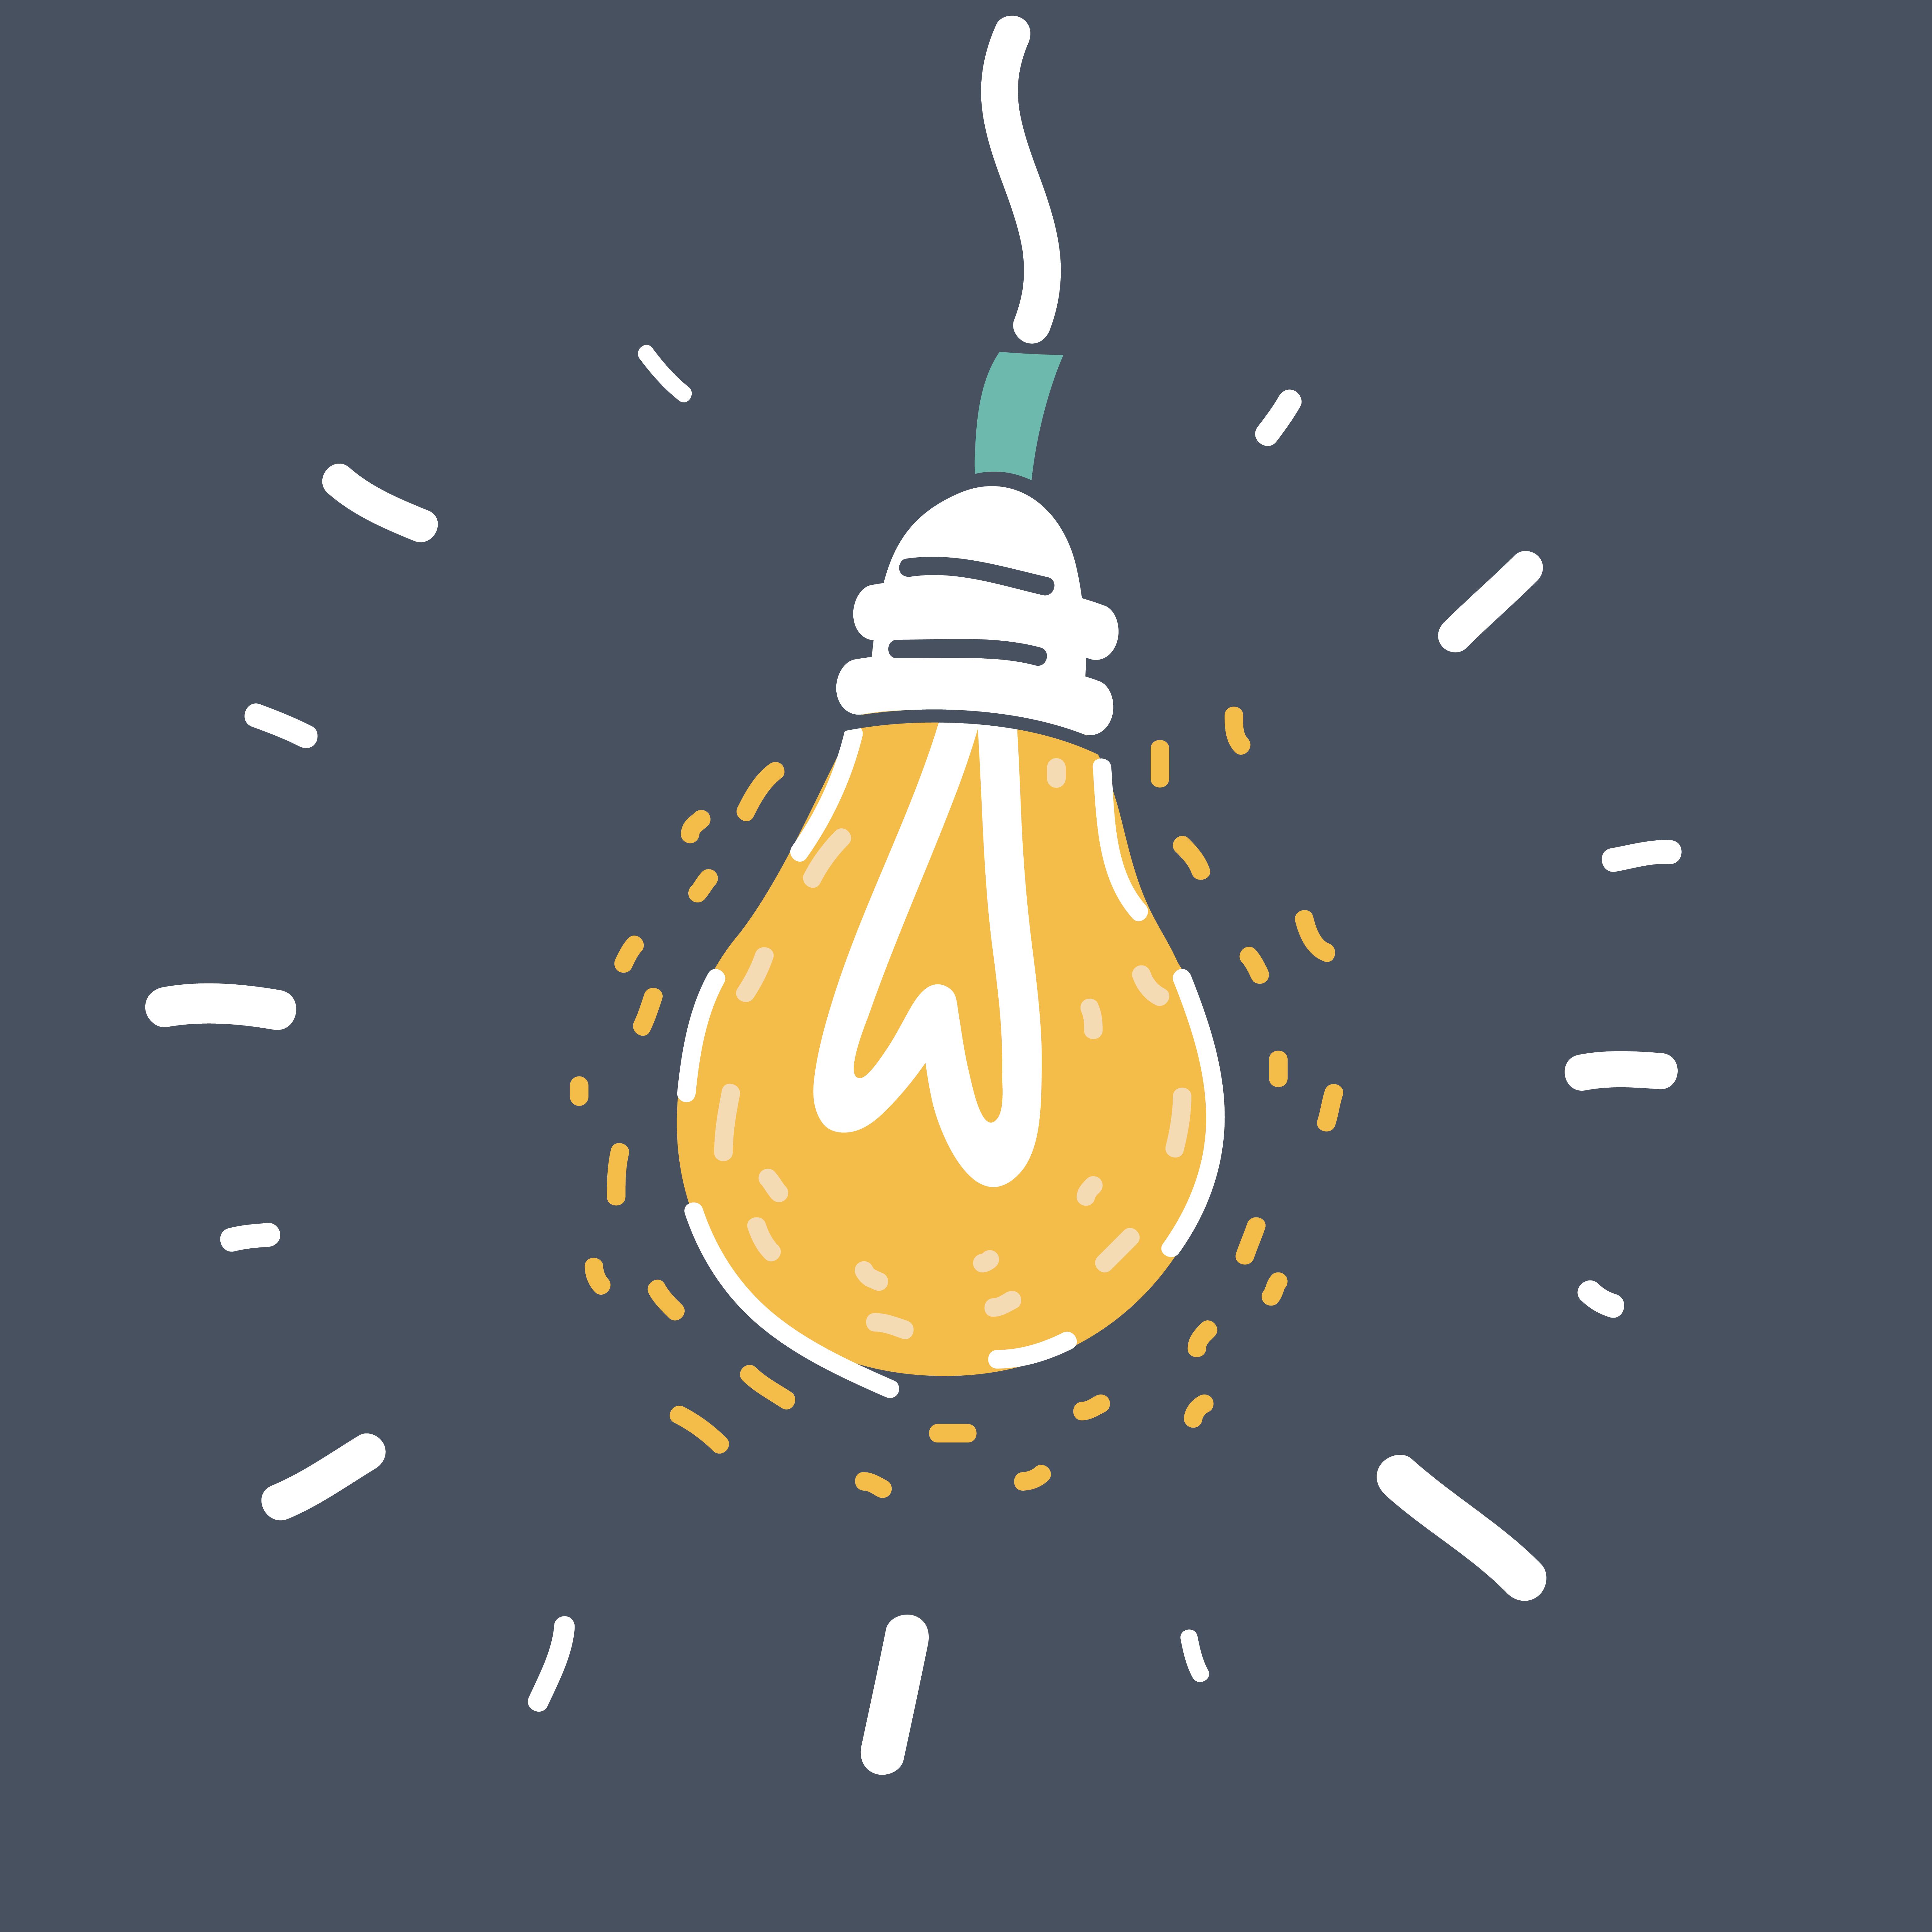 The Idea Readiness Tool - Light